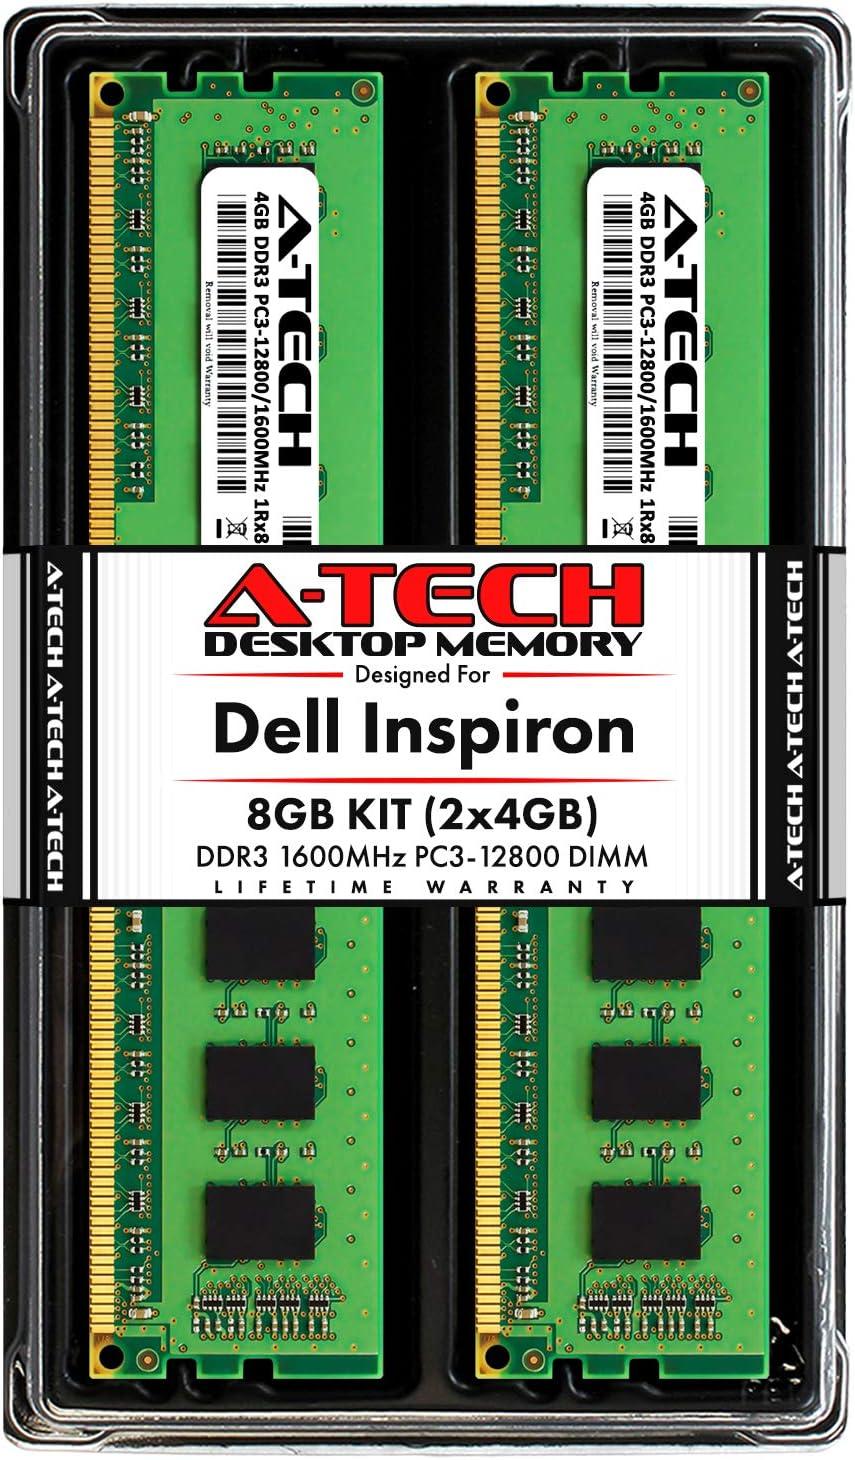 A-Tech 8GB (2x4GB) RAM for Dell Inspiron 660, 660s | DDR3 1600MHz DIMM PC3-12800 240-Pin Non-ECC UDIMM Desktop Memory Upgrade Kit